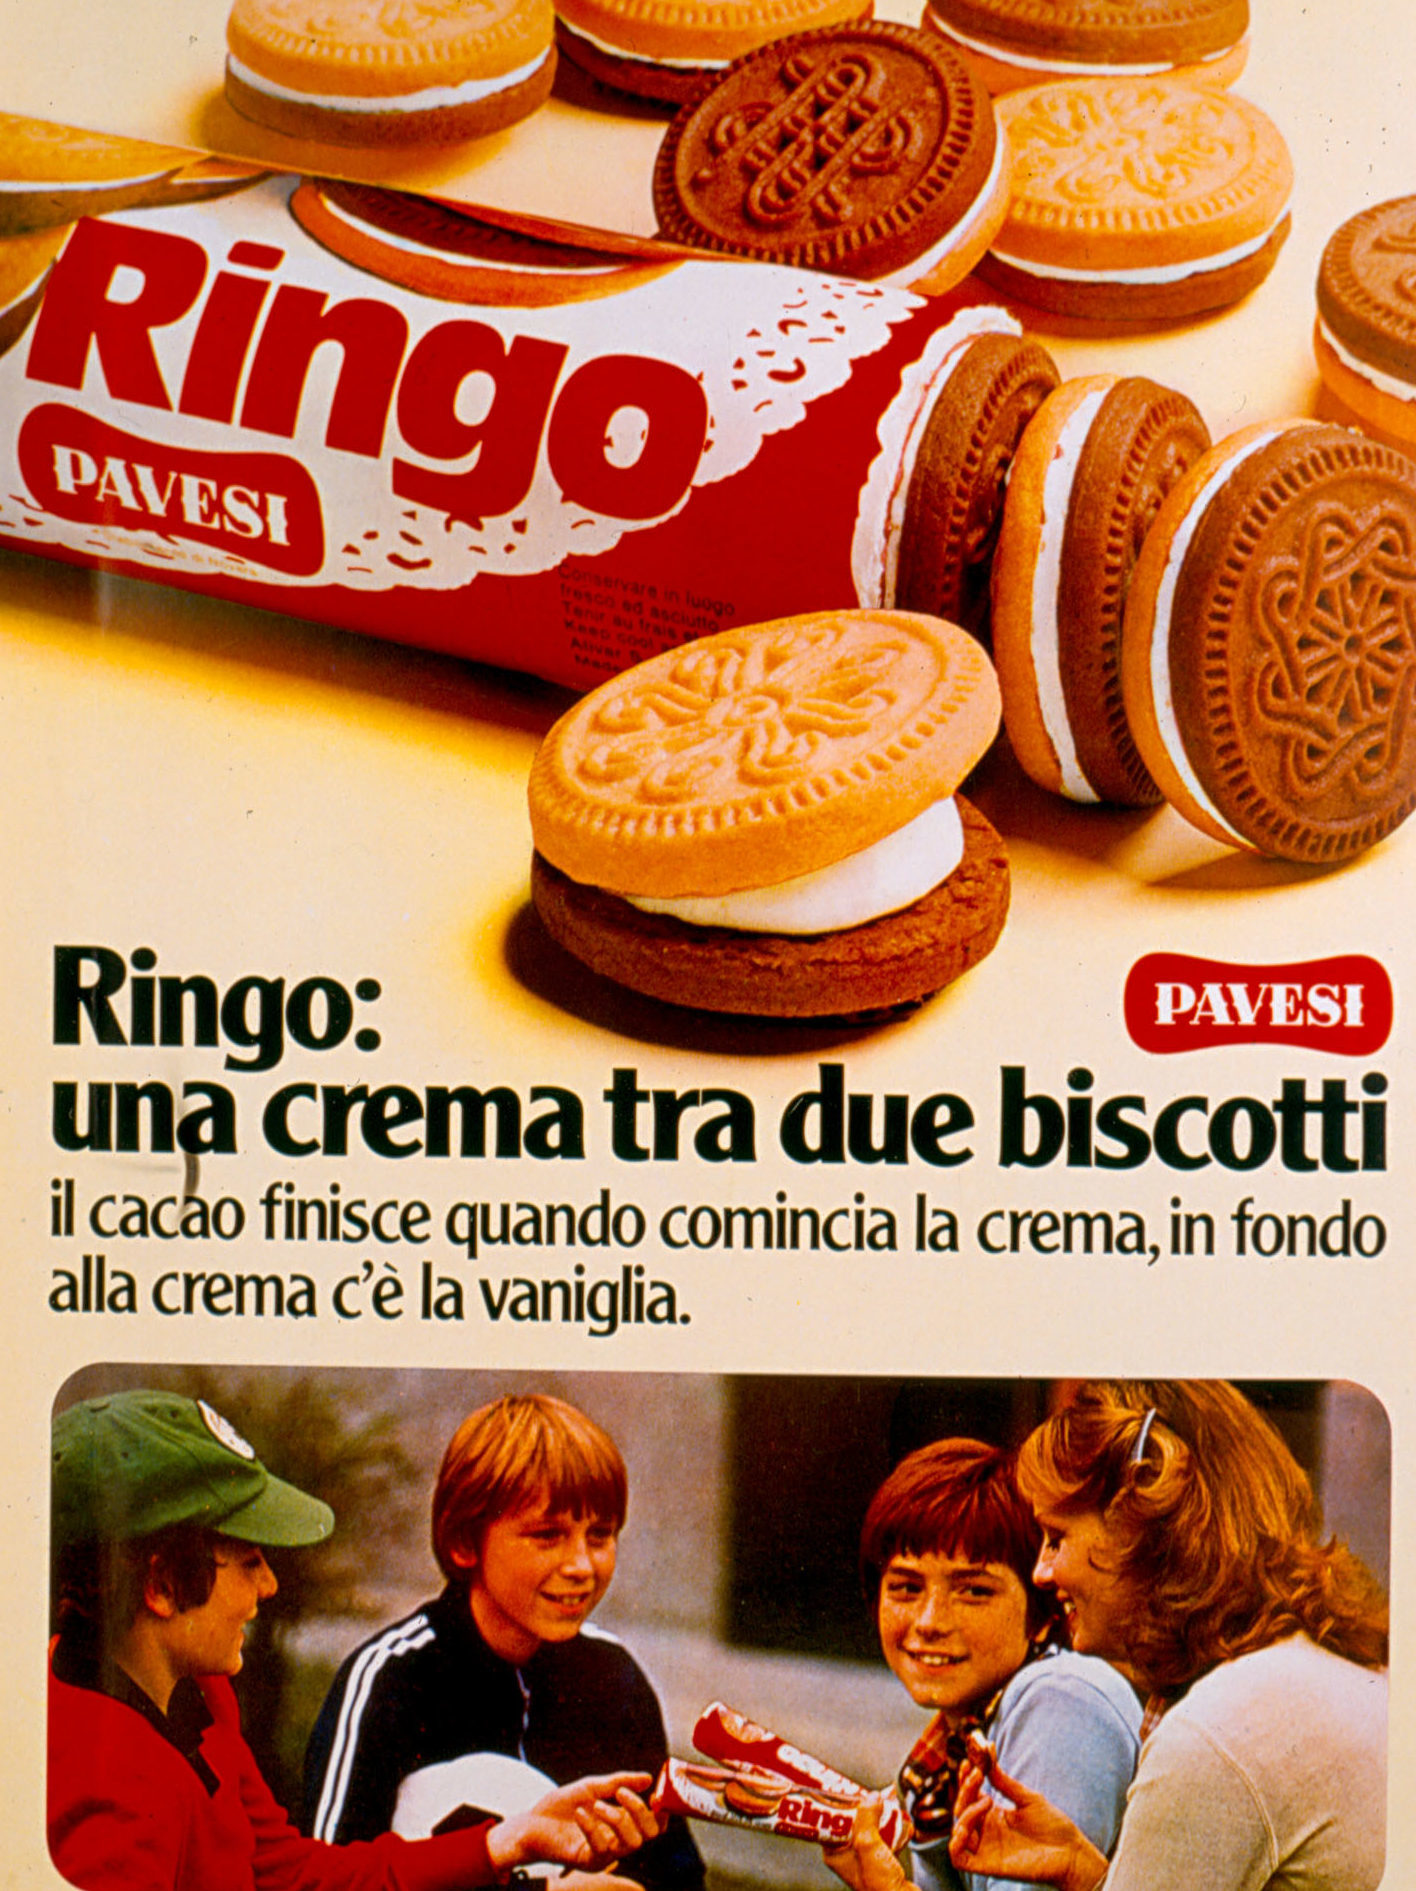 Pubblicità stampa - Ringo, una crema tra due biscotti, 1977